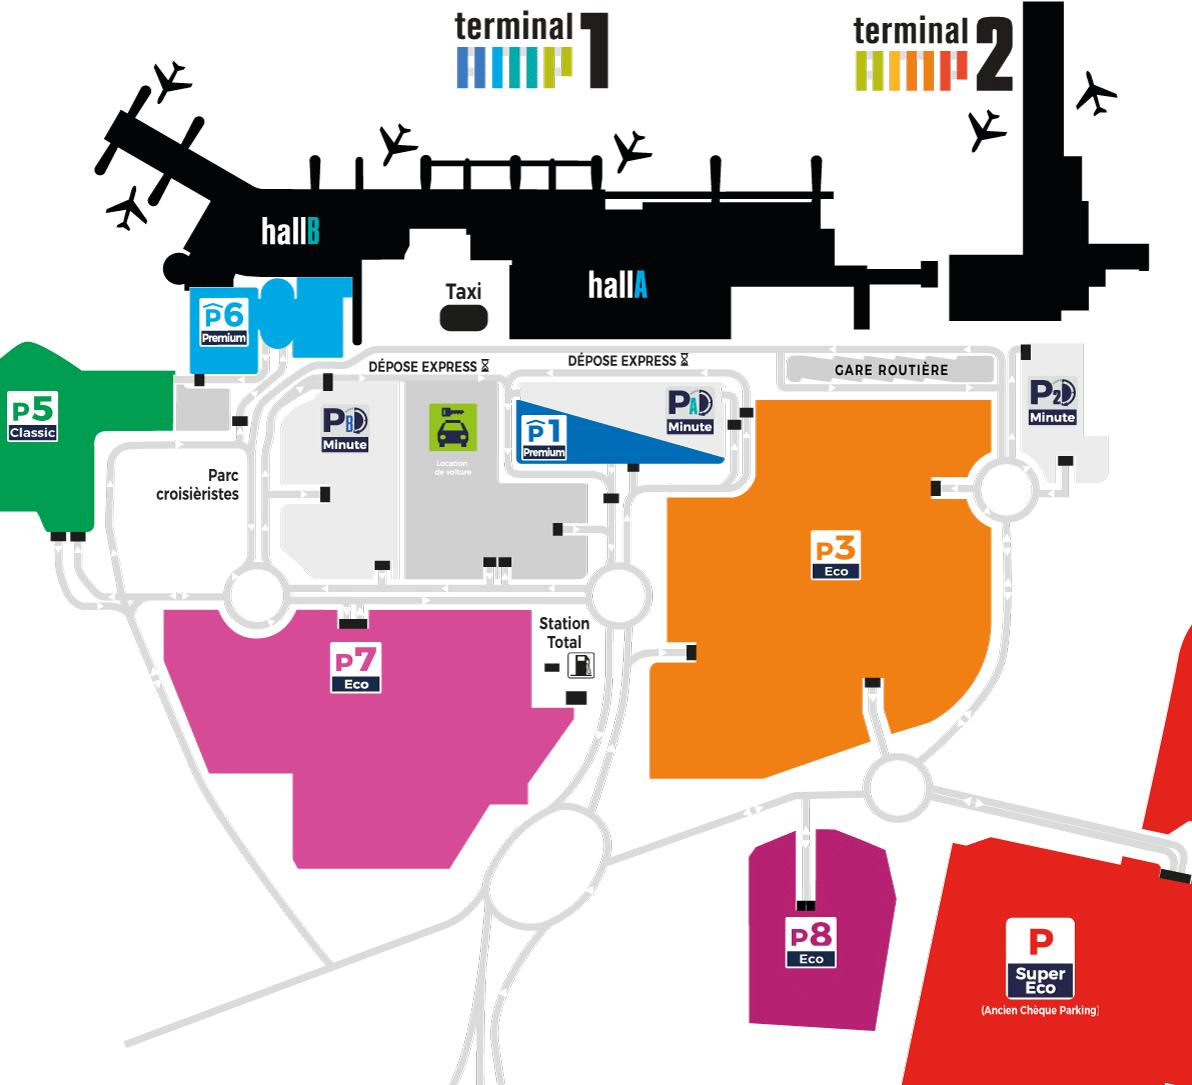 MRS-Departures-Marseille-Airport-parking-map